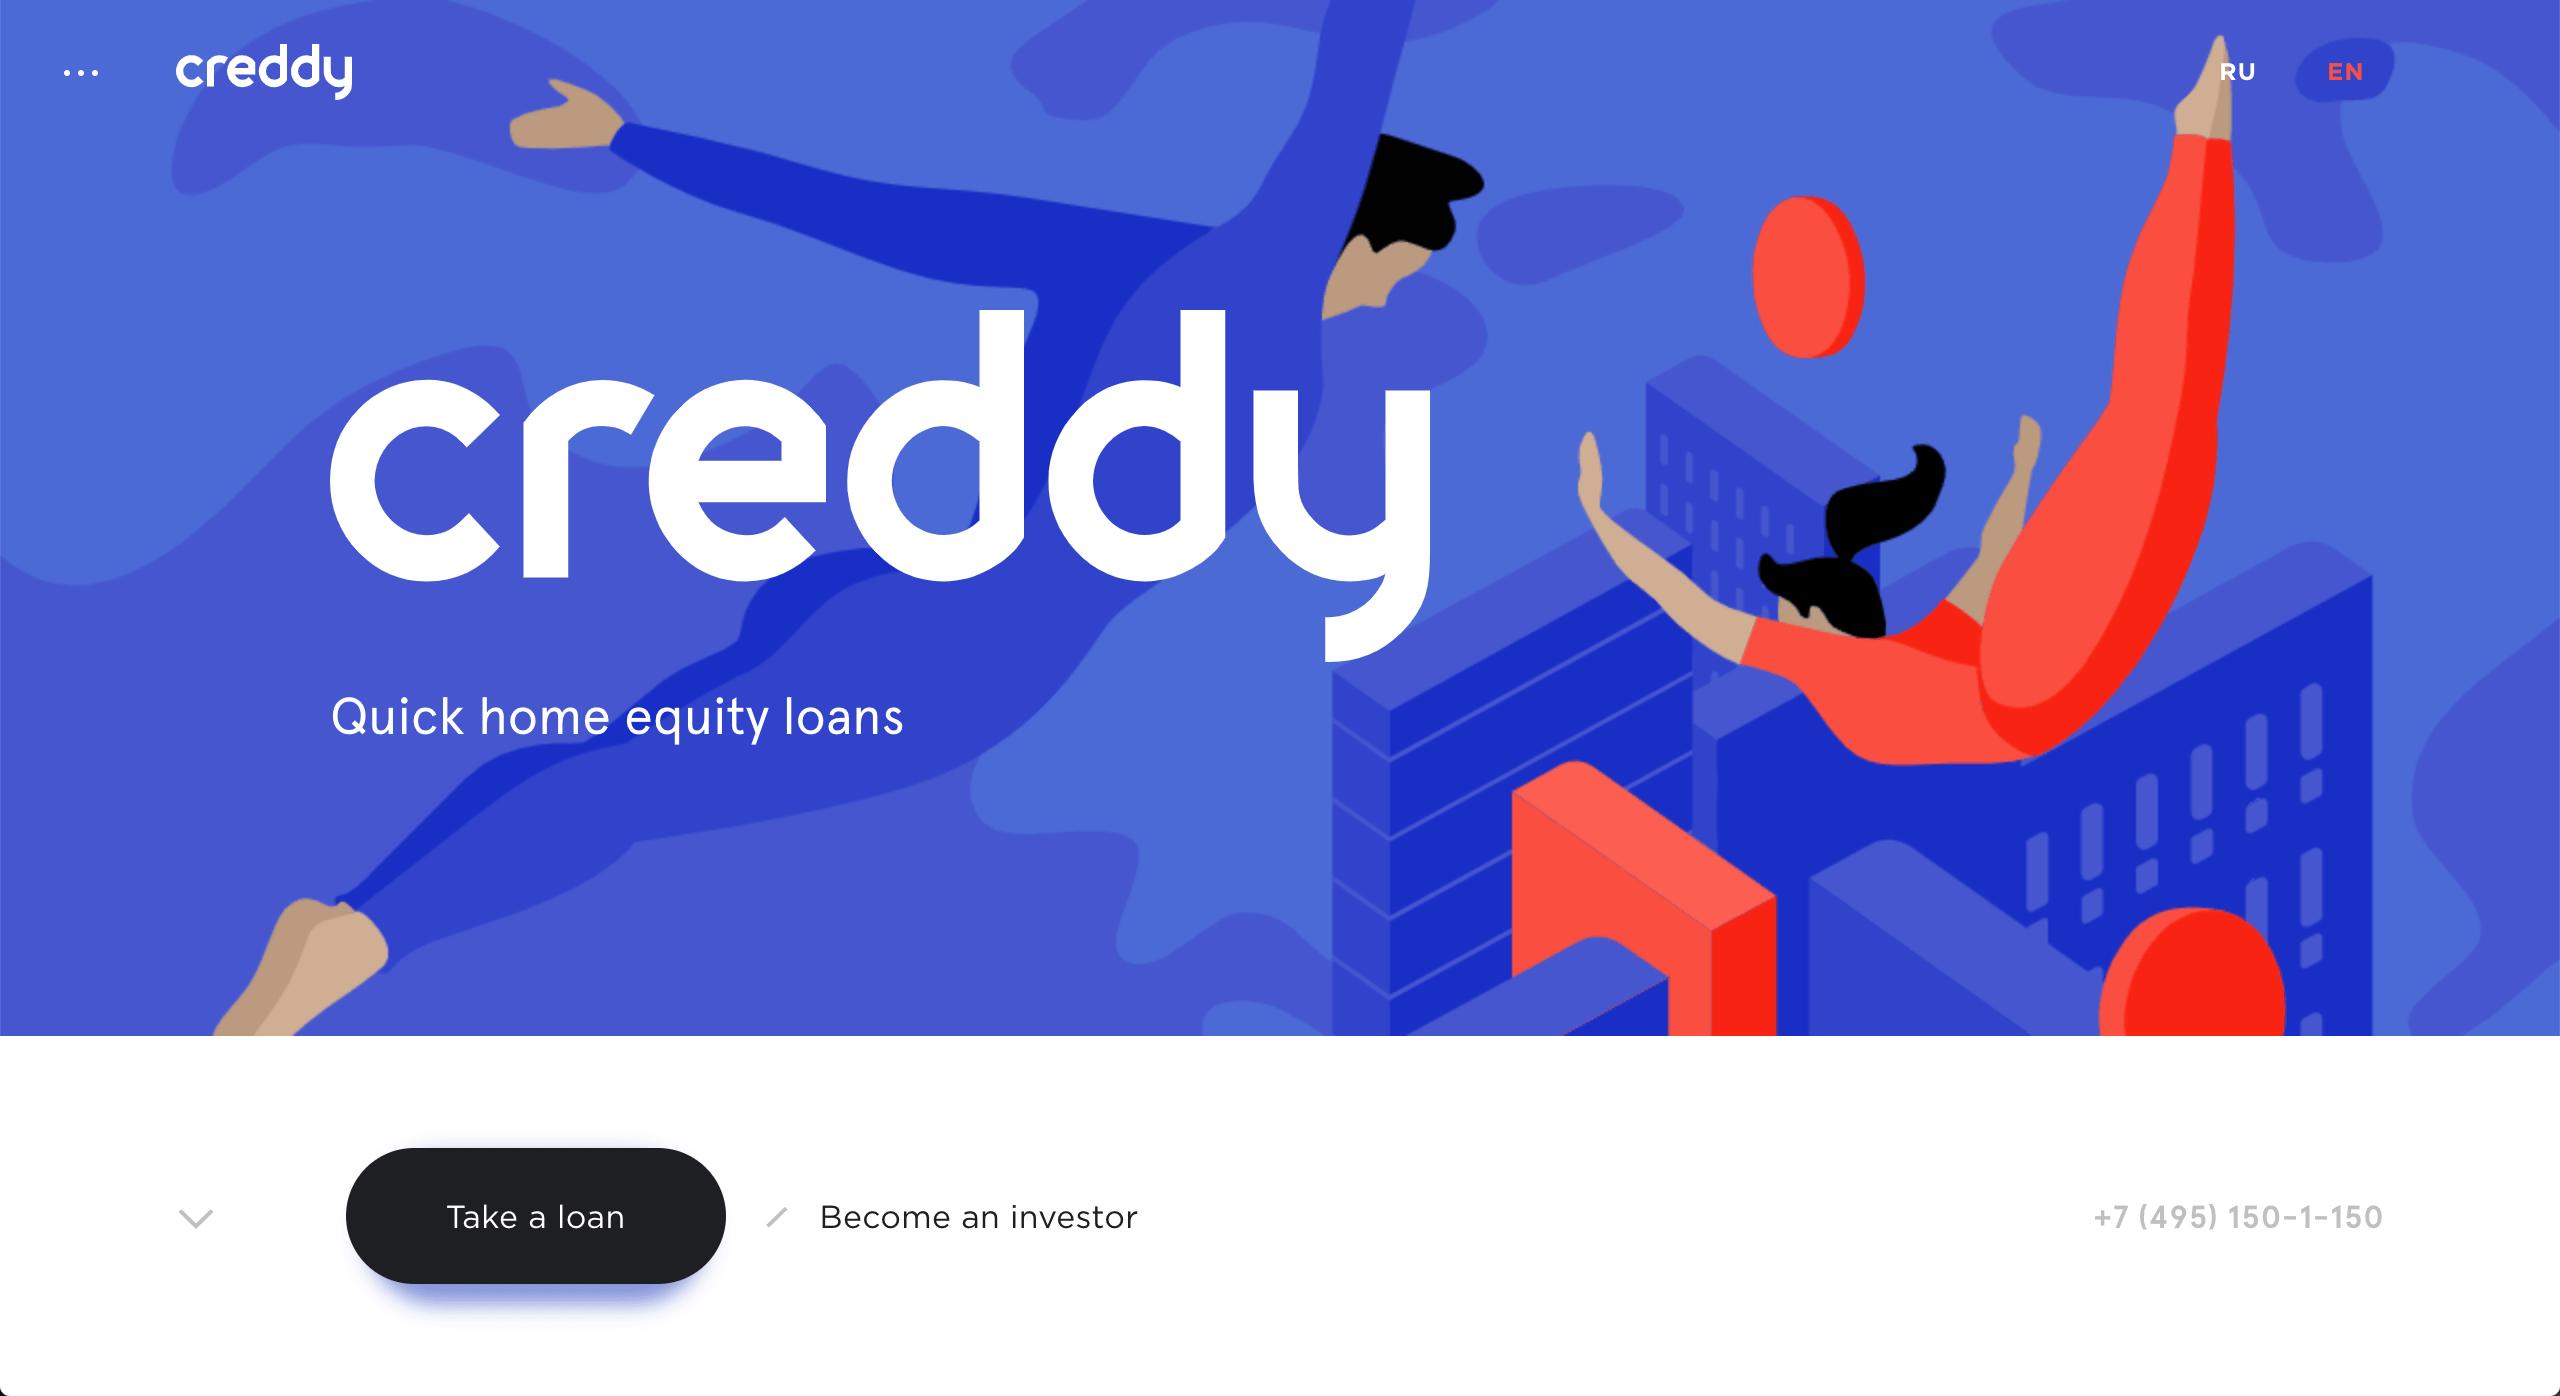 Creddy-1